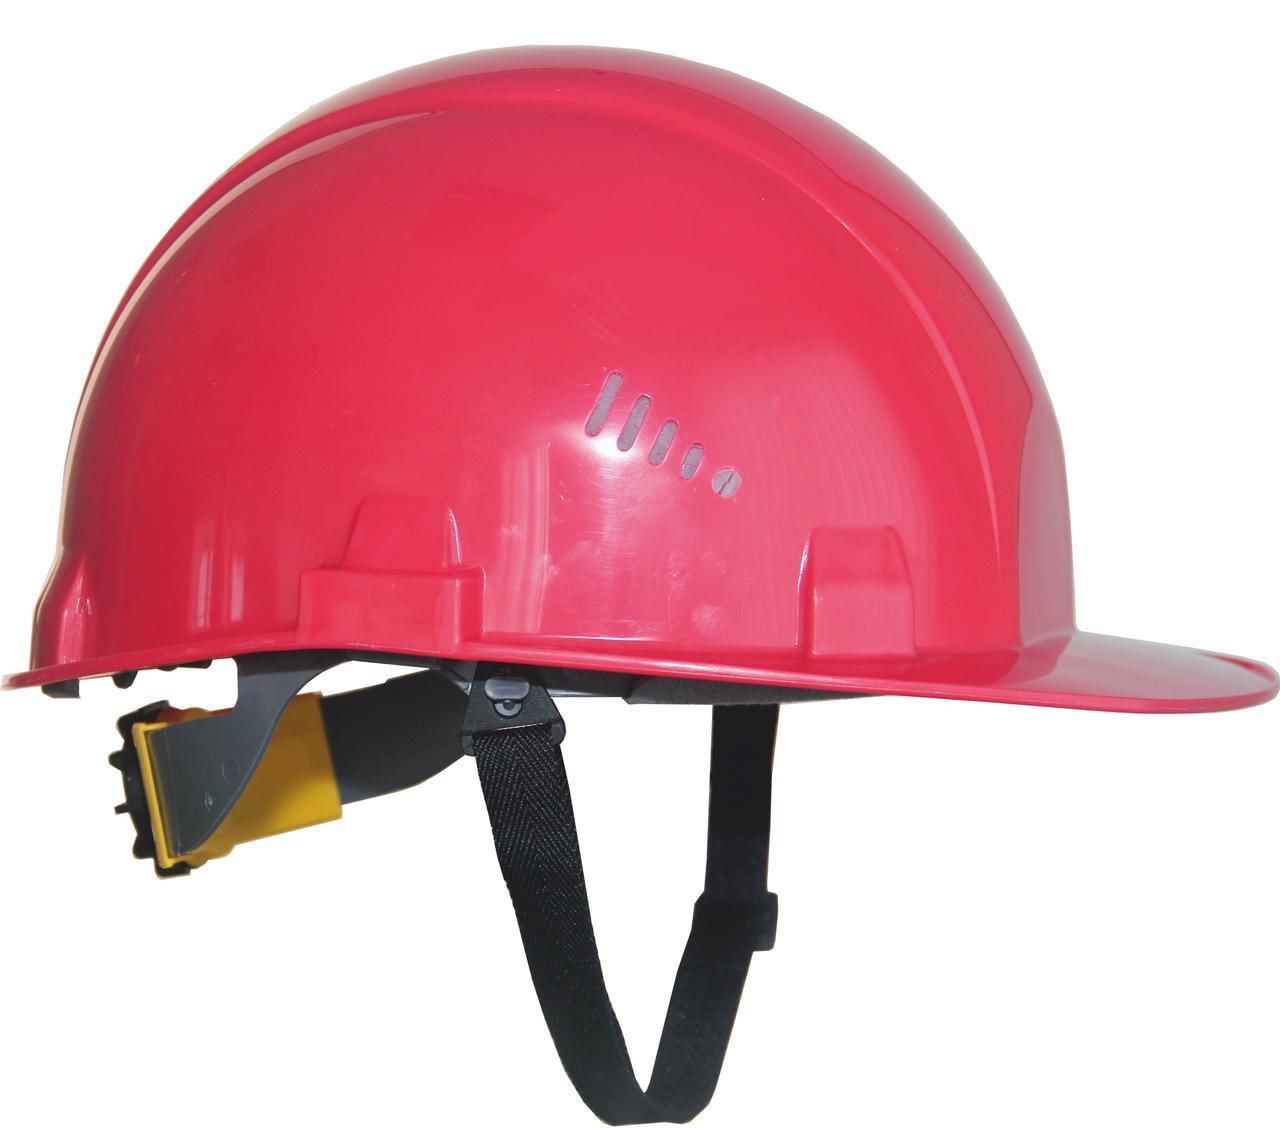 Каска промышленная Rapid красная